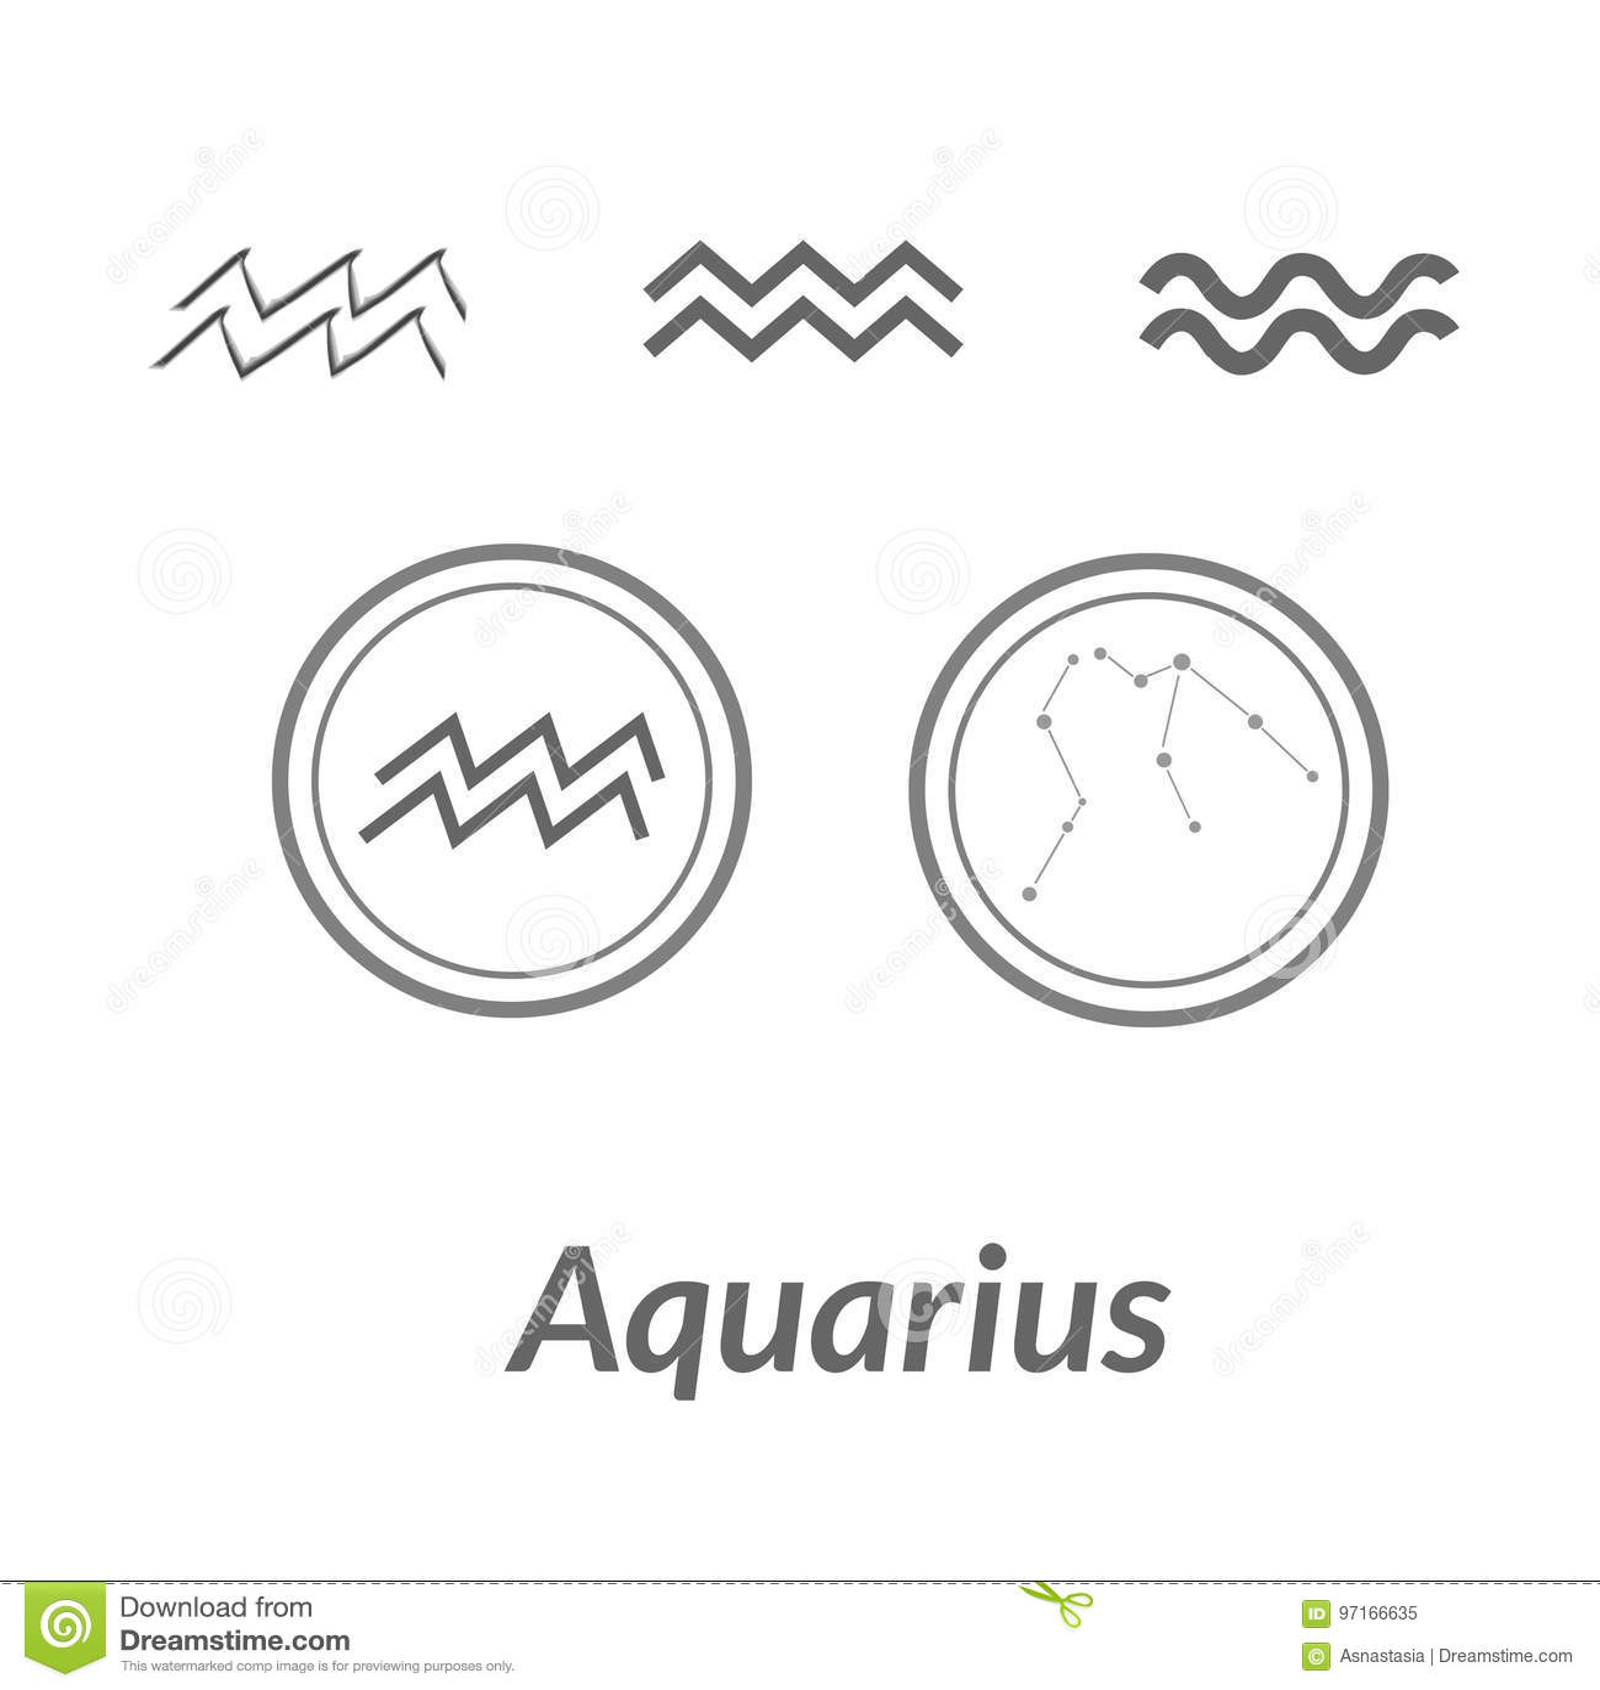 The Water Bearer Aquarius Sing Star Constellation Vector Element